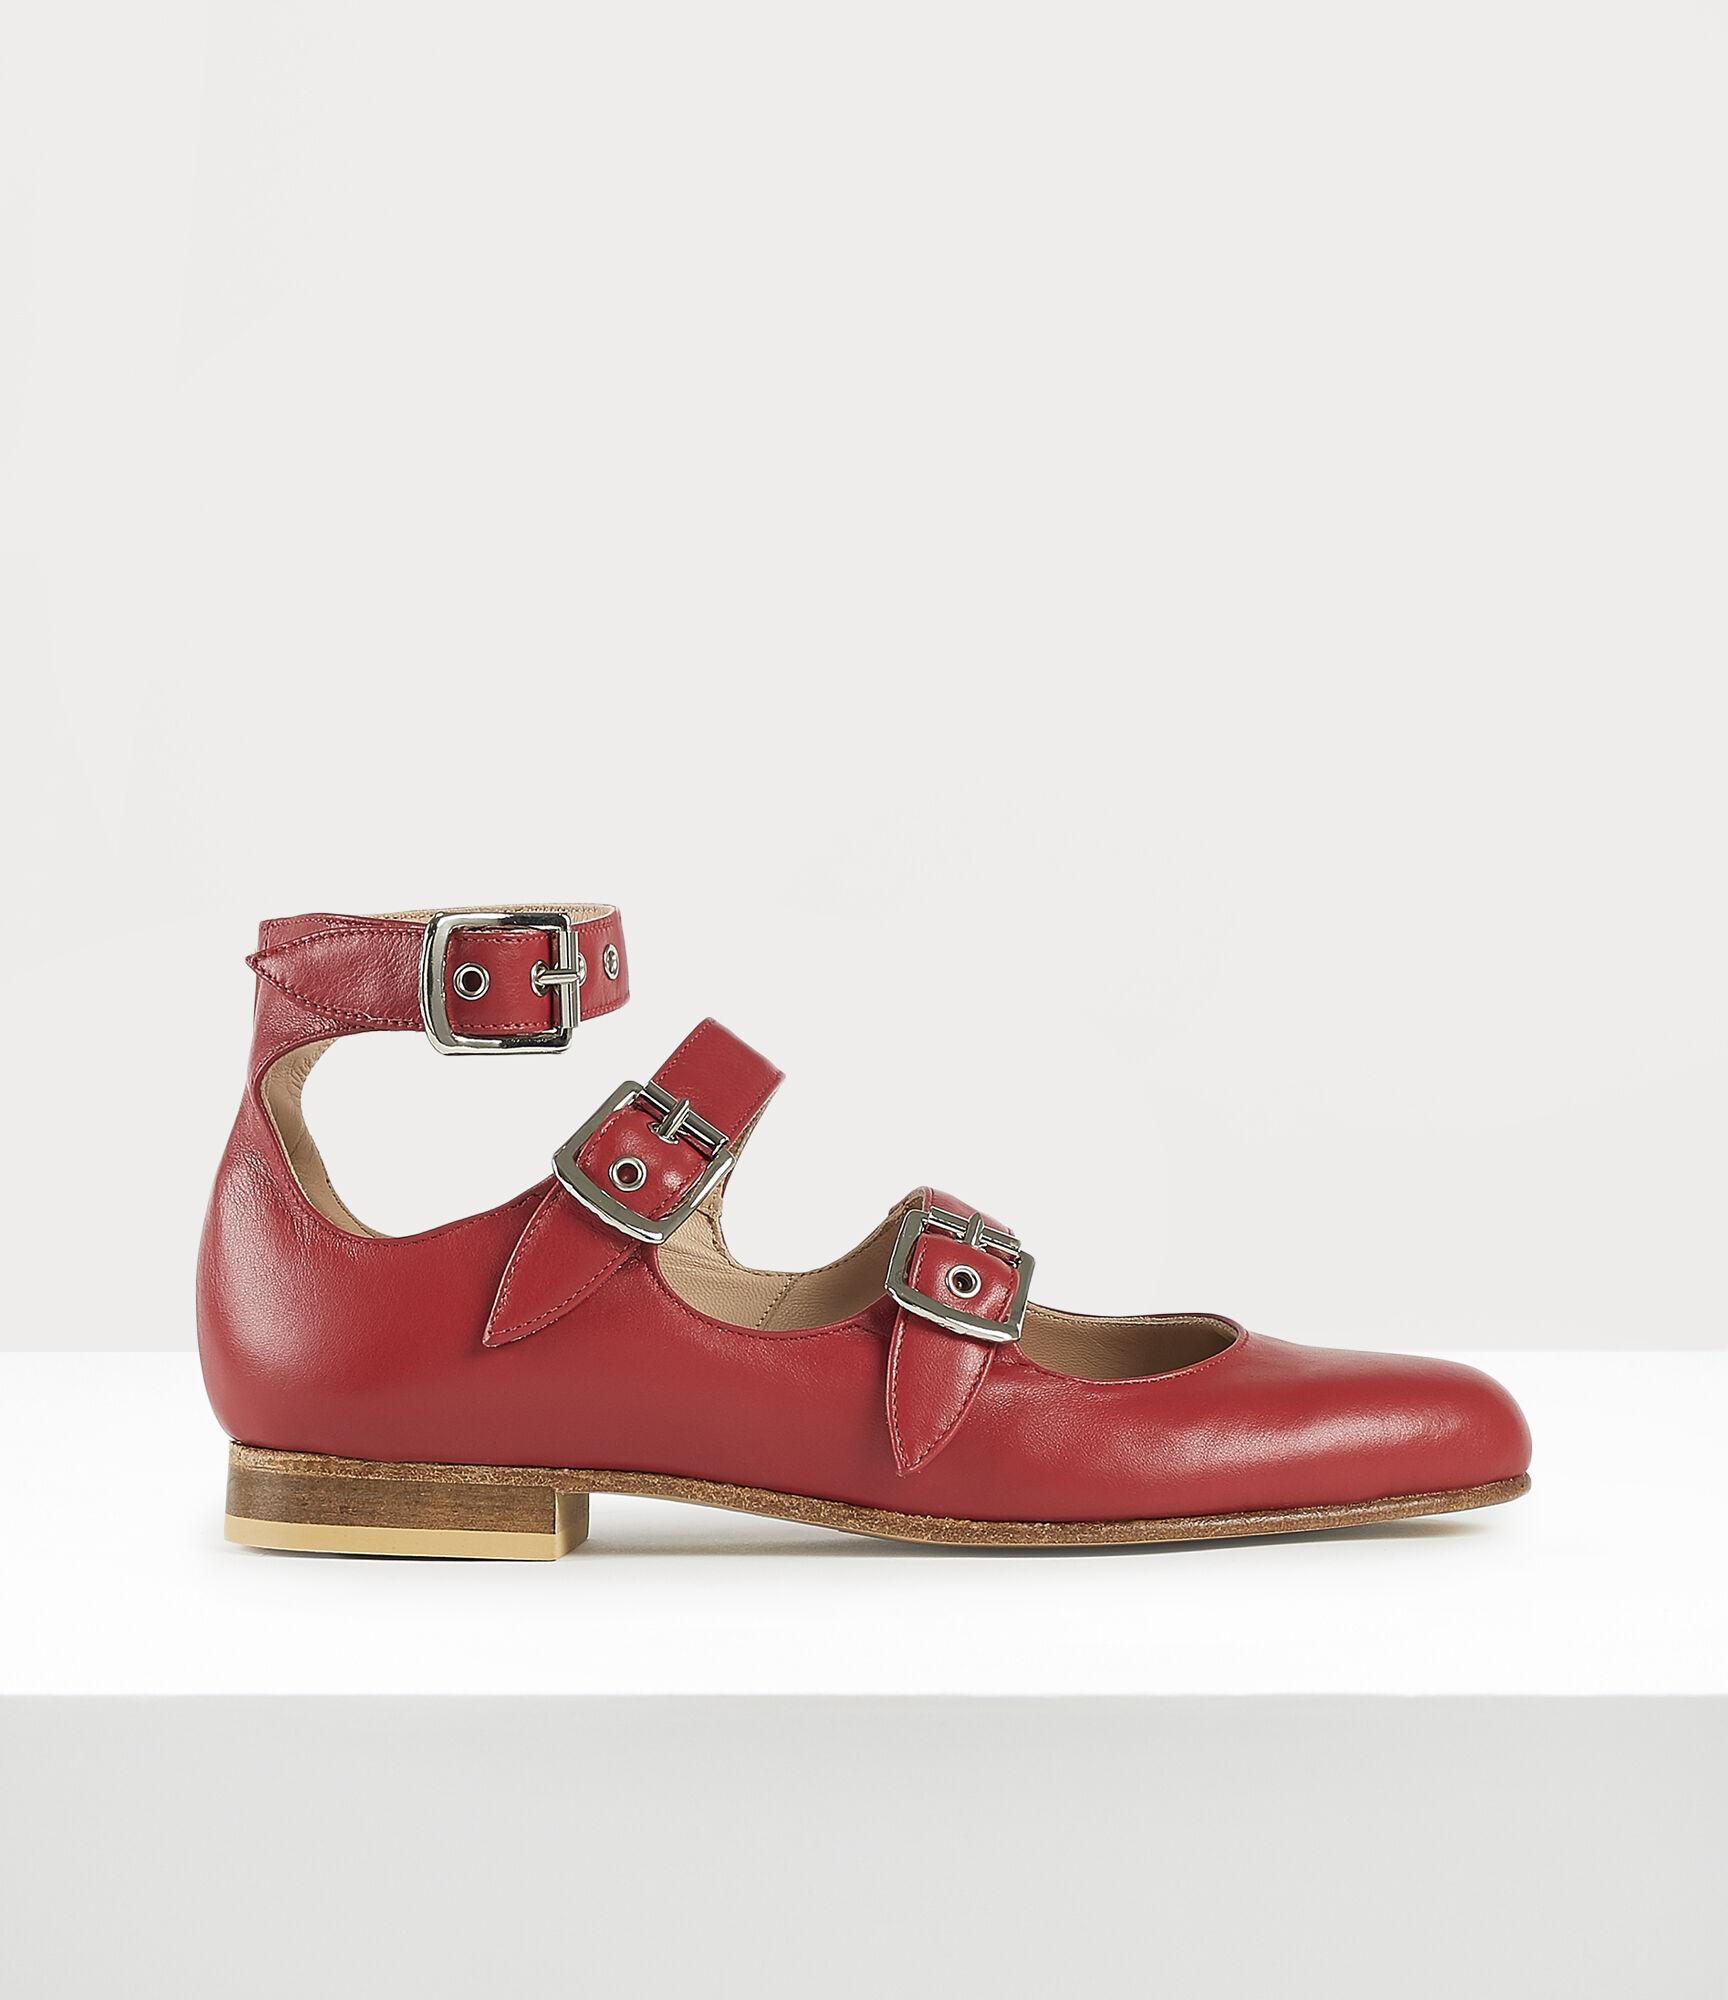 Men's Loafers | Vivienne Westwood